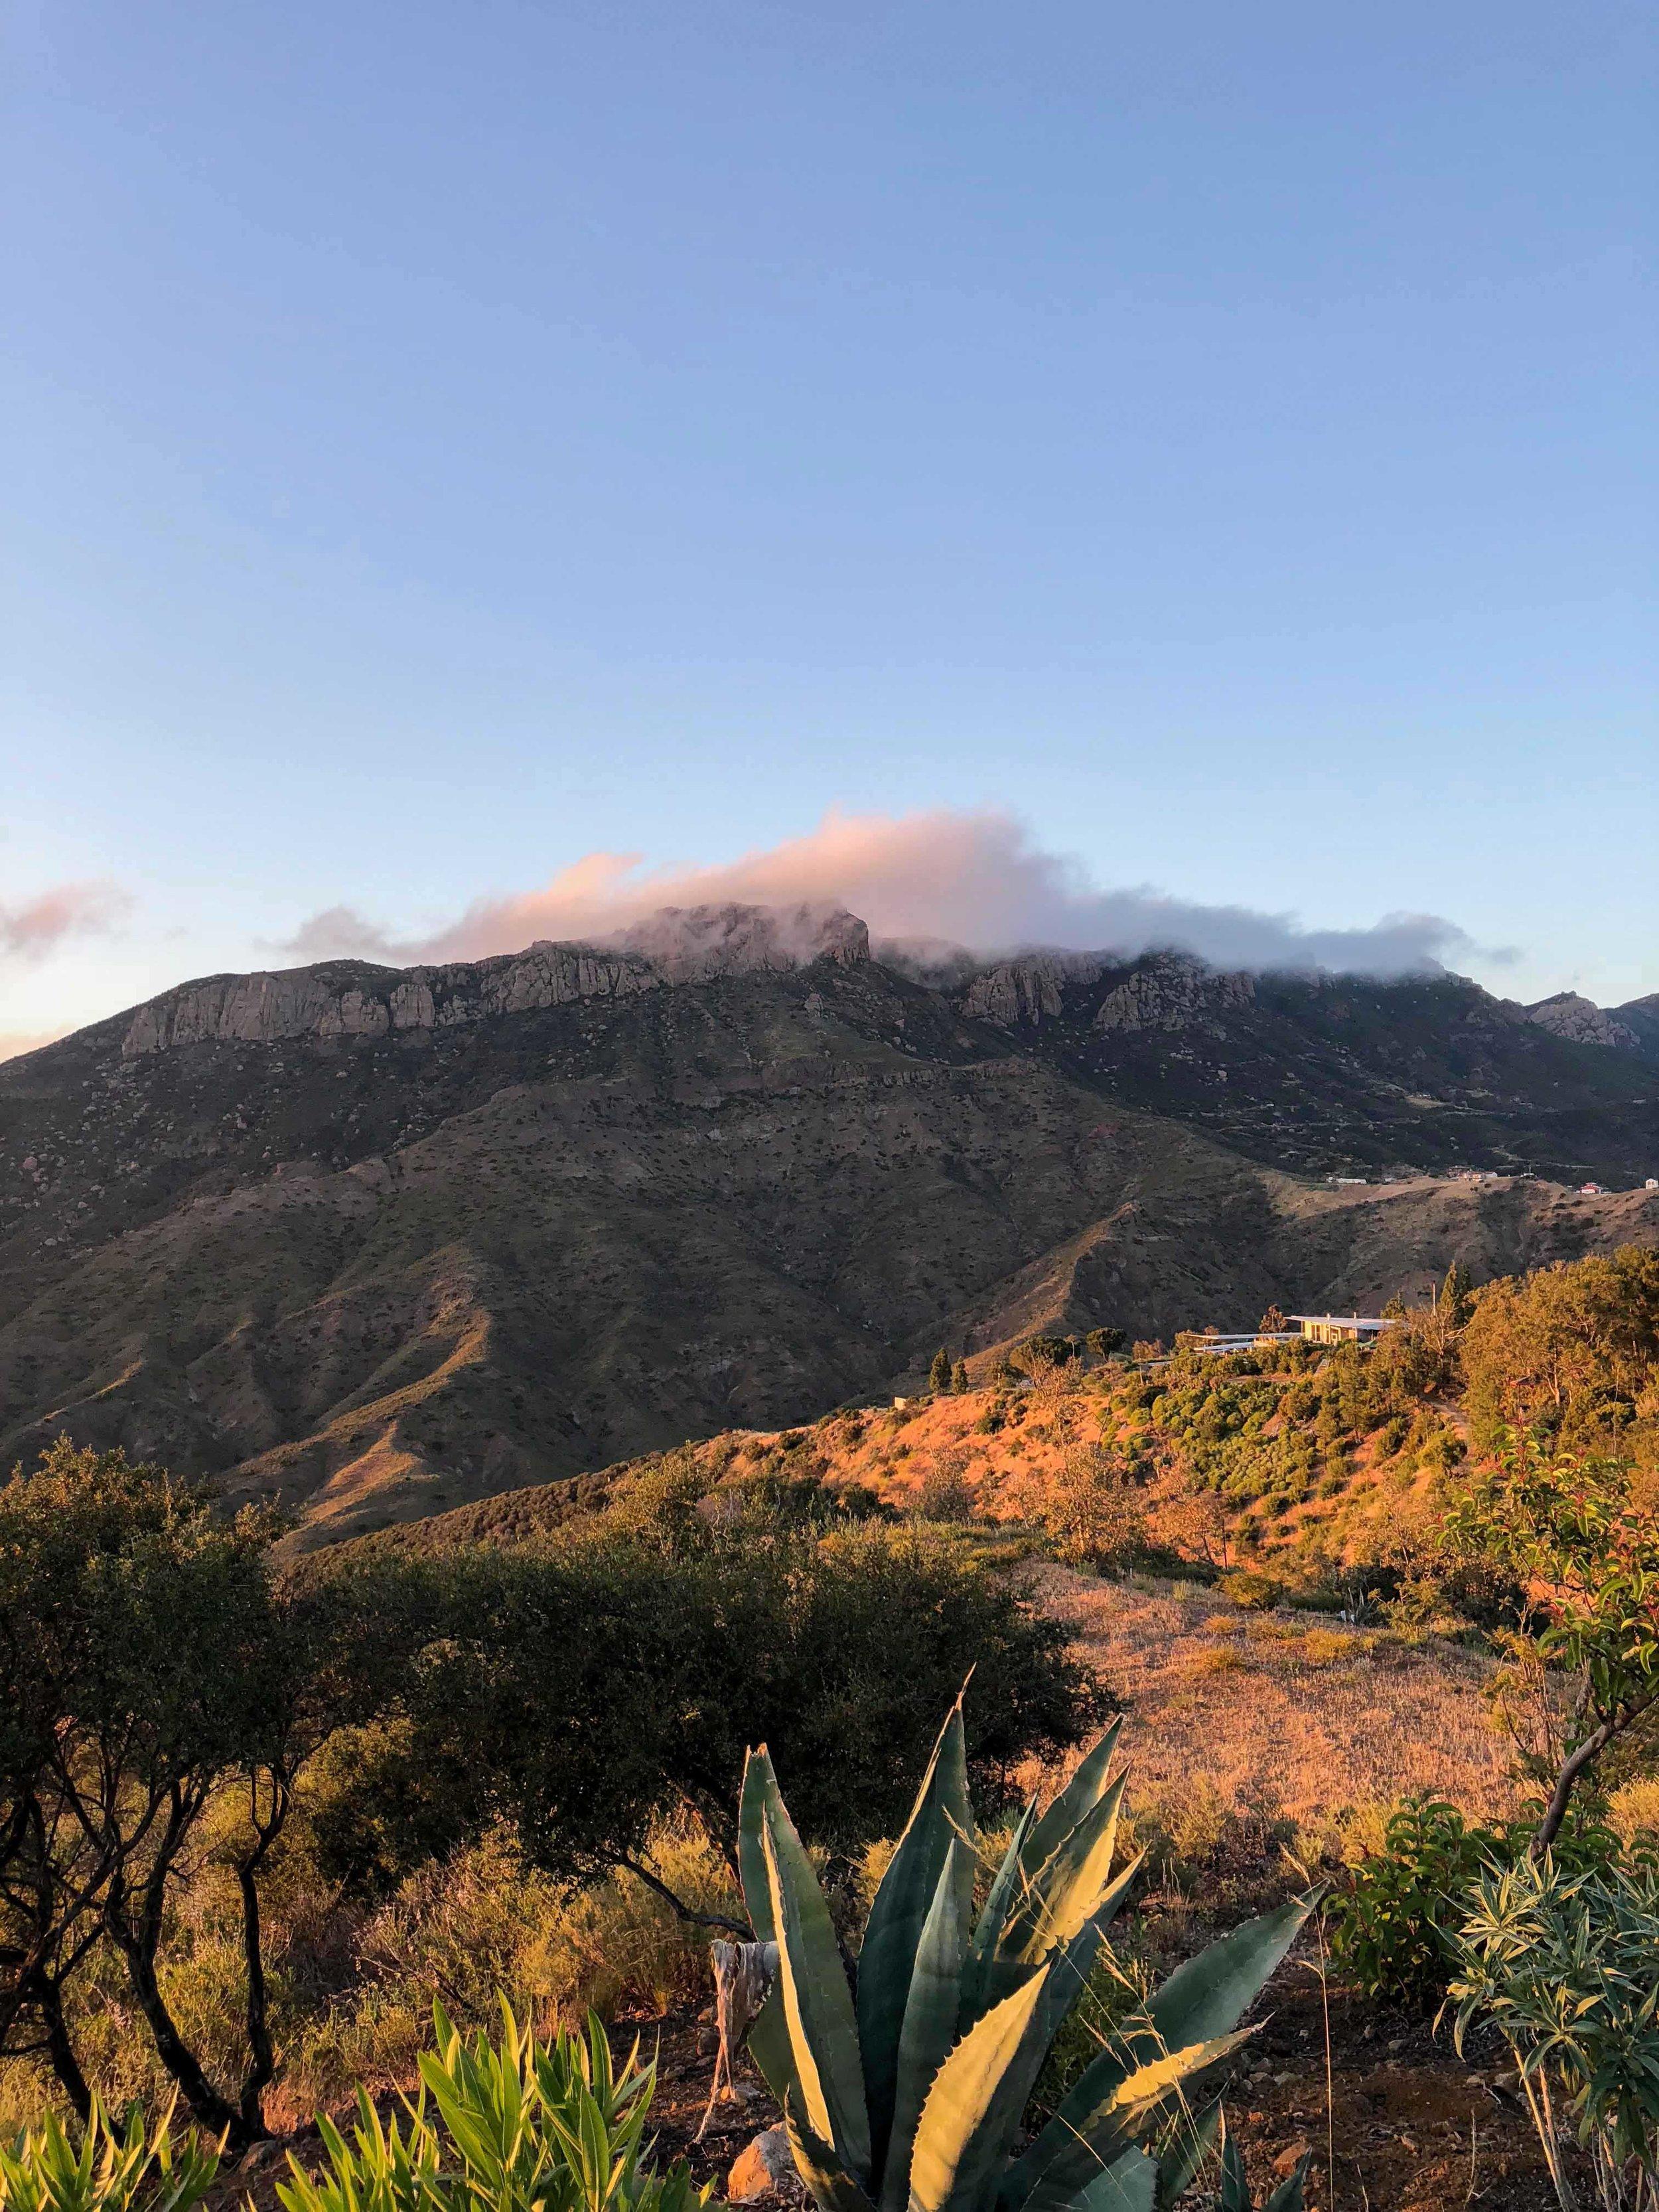 S.E.A.-Studio-Environmental-Architecture-David-Hertz-FAIA-Tony-Duquette-Xanabu-Malibu-California-adaptive-reuse-sustainable-regenerative-restorative-green-design-airplane-upcycle-recycle-found-object-historic-preservation-Hollywood-set-bony-ridge-6.jpg